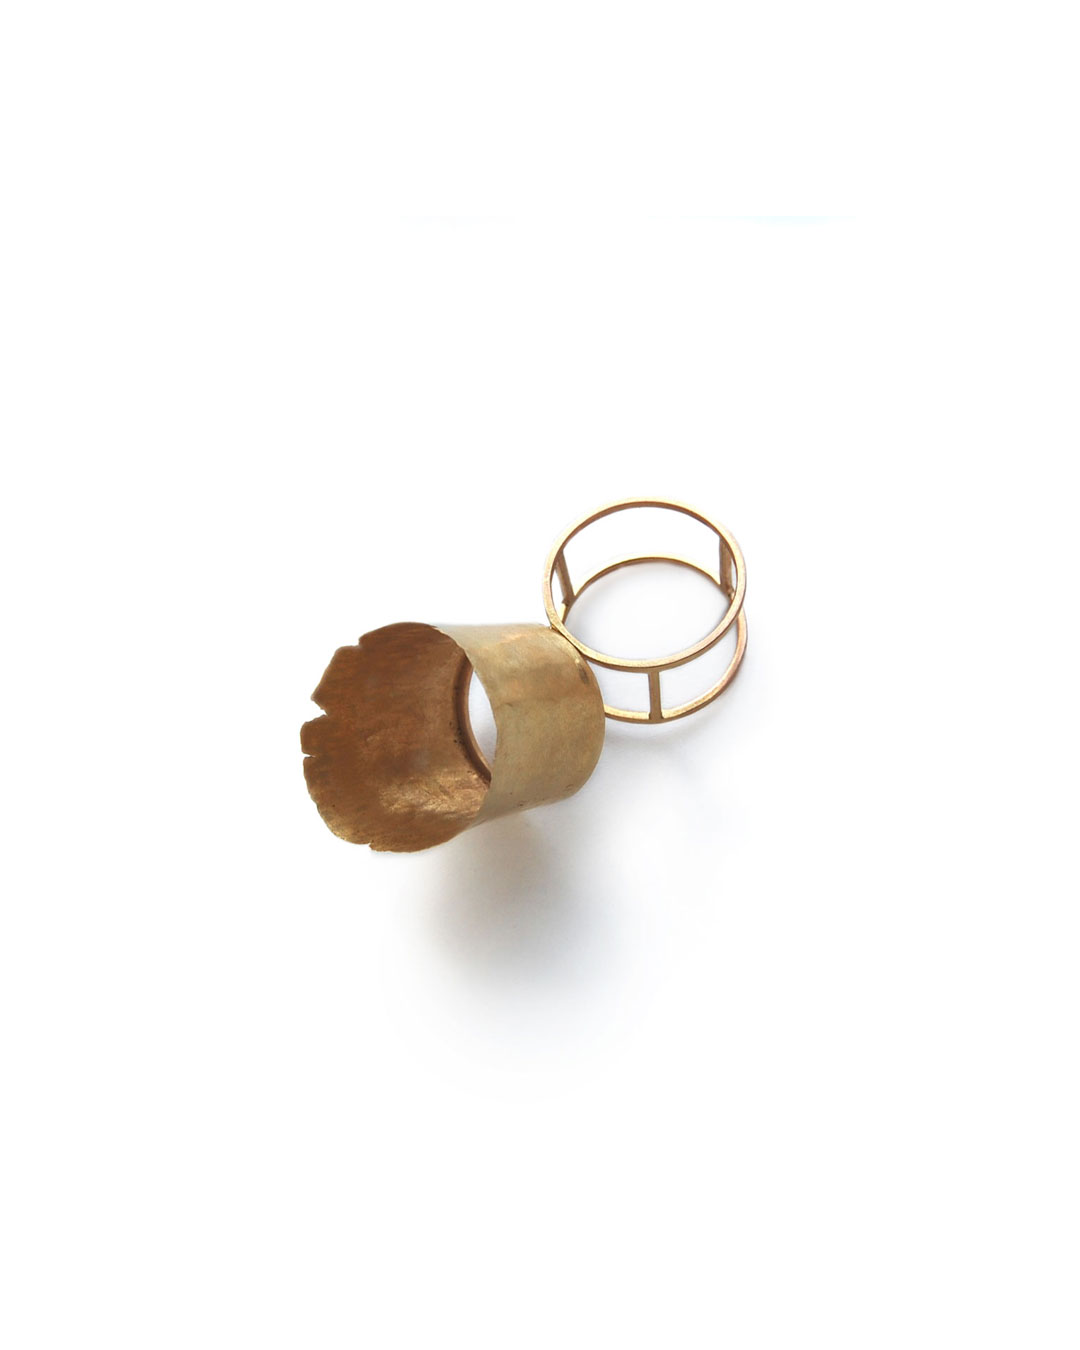 Stefano Marchetti, untitled, 2008, ring; gold, 41 x 41 x 36 mm, €3000